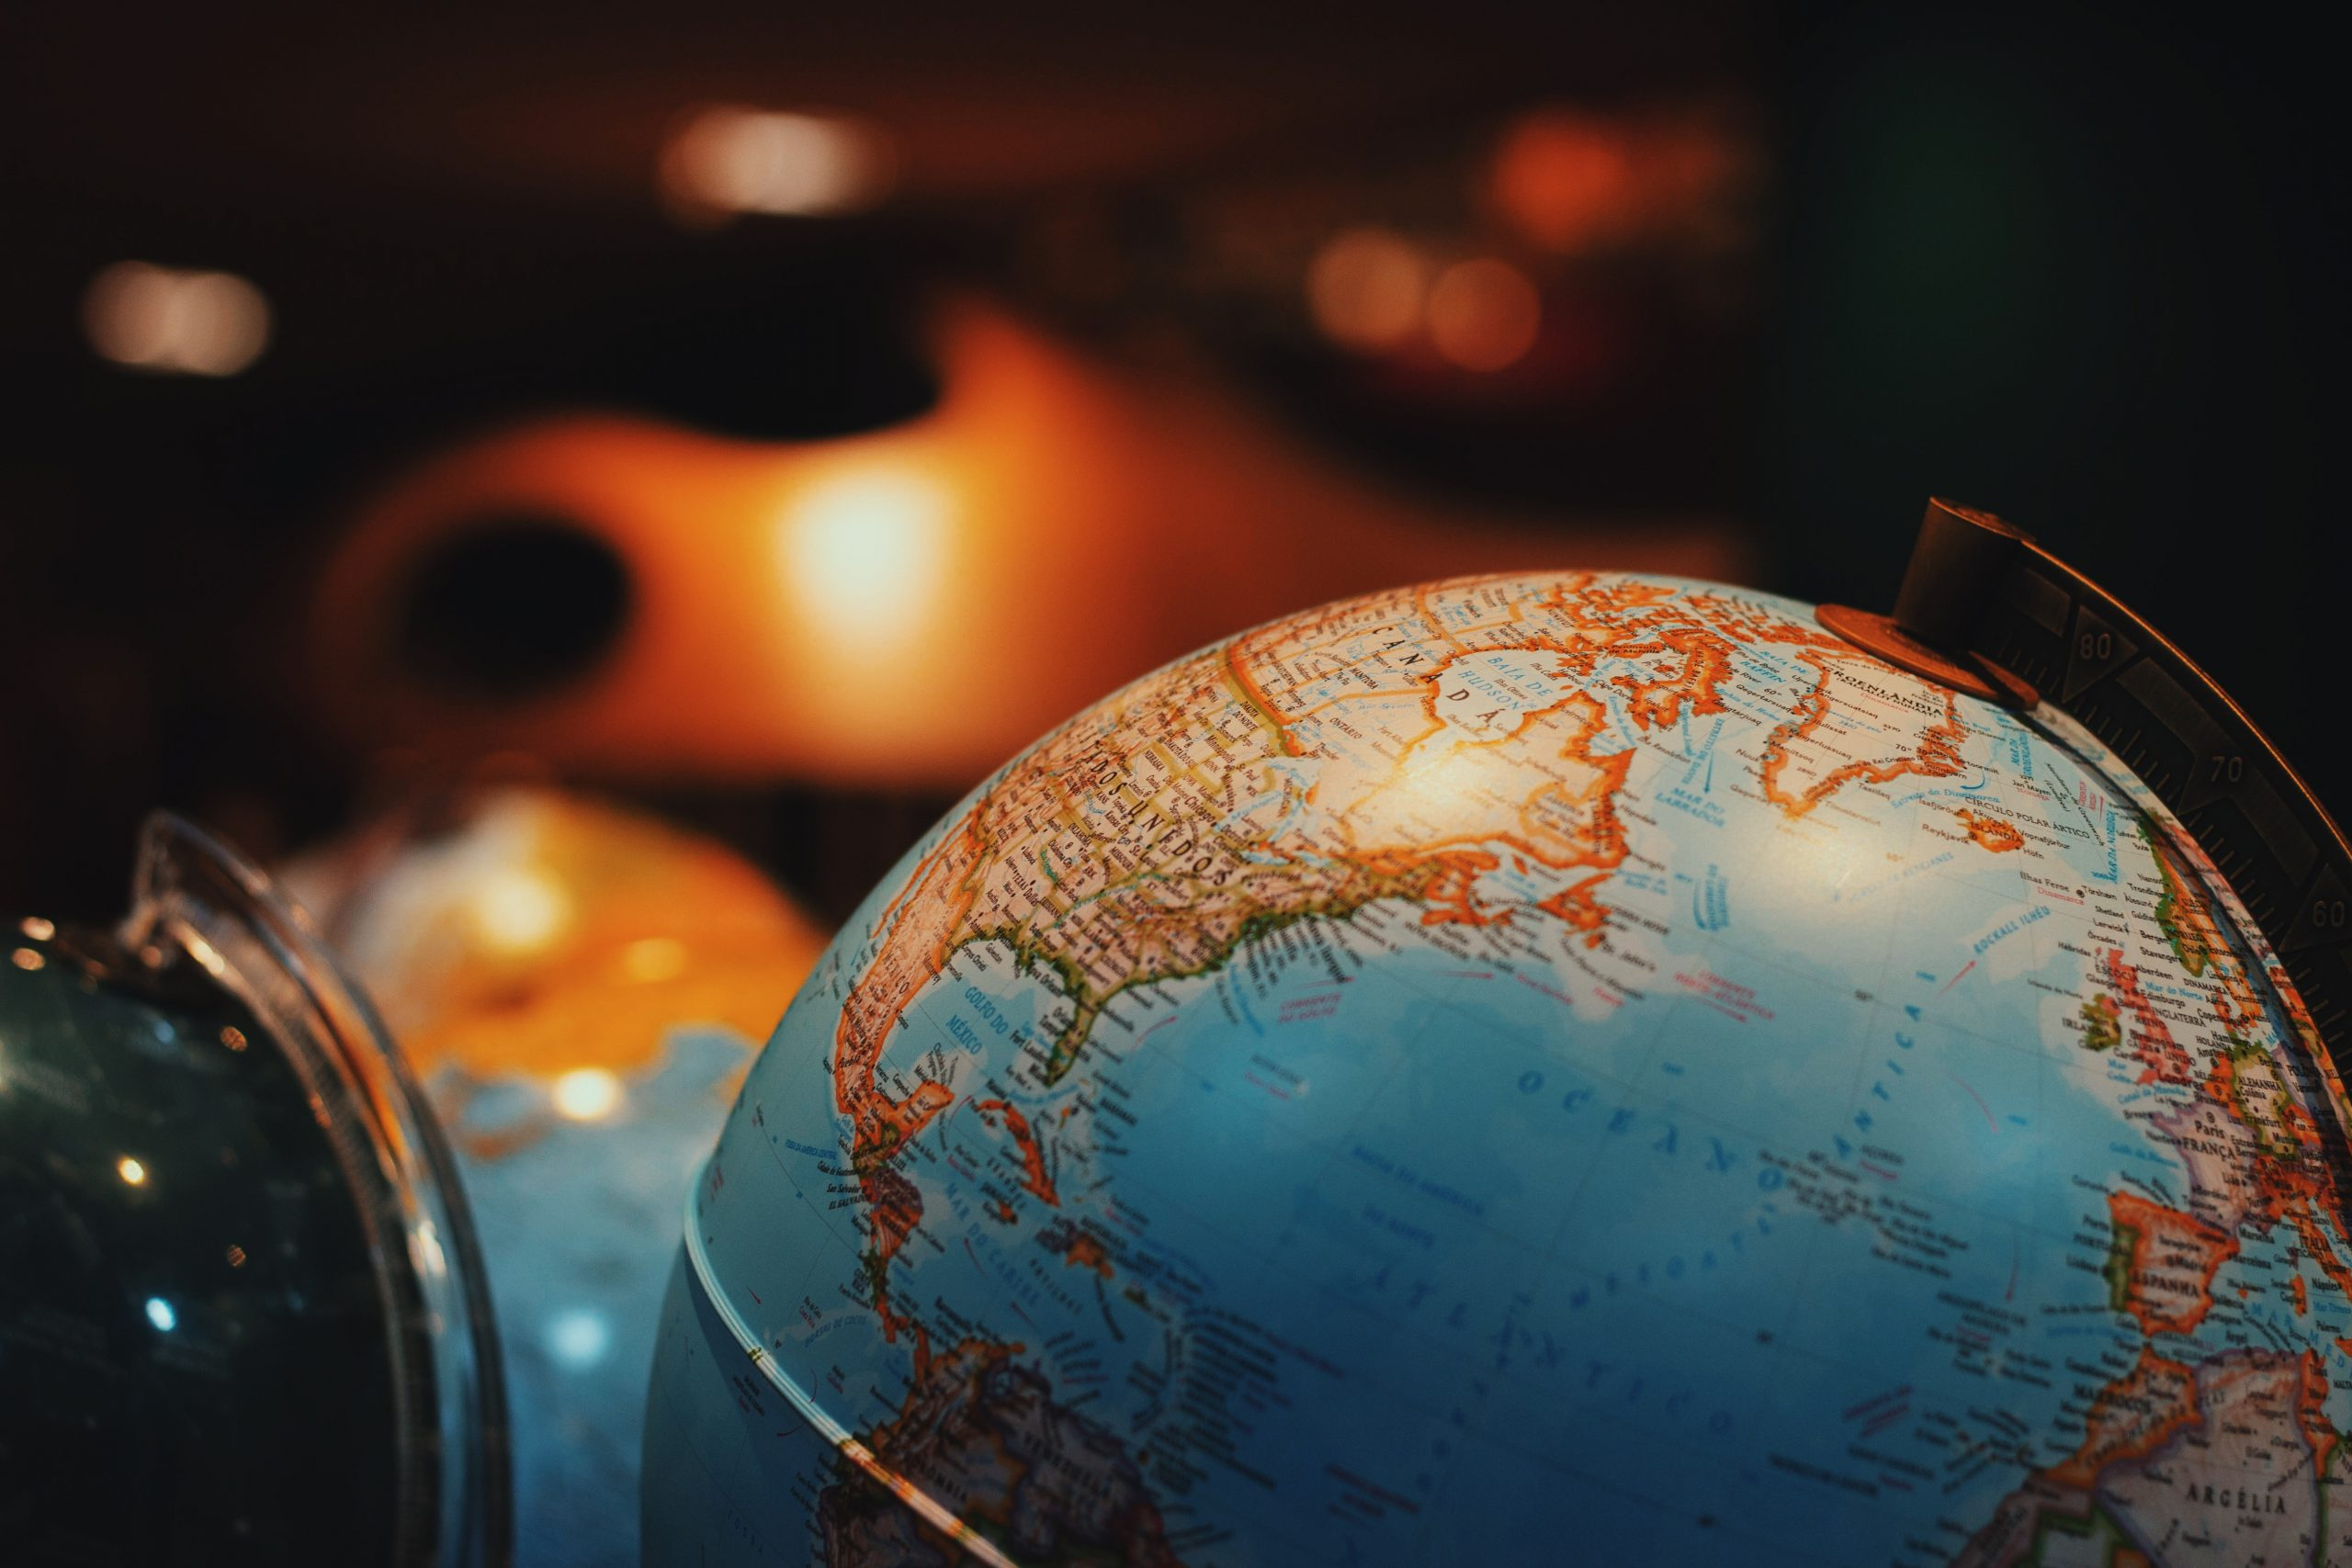 Globe representing Ordnance Survey's global geospatial data capability